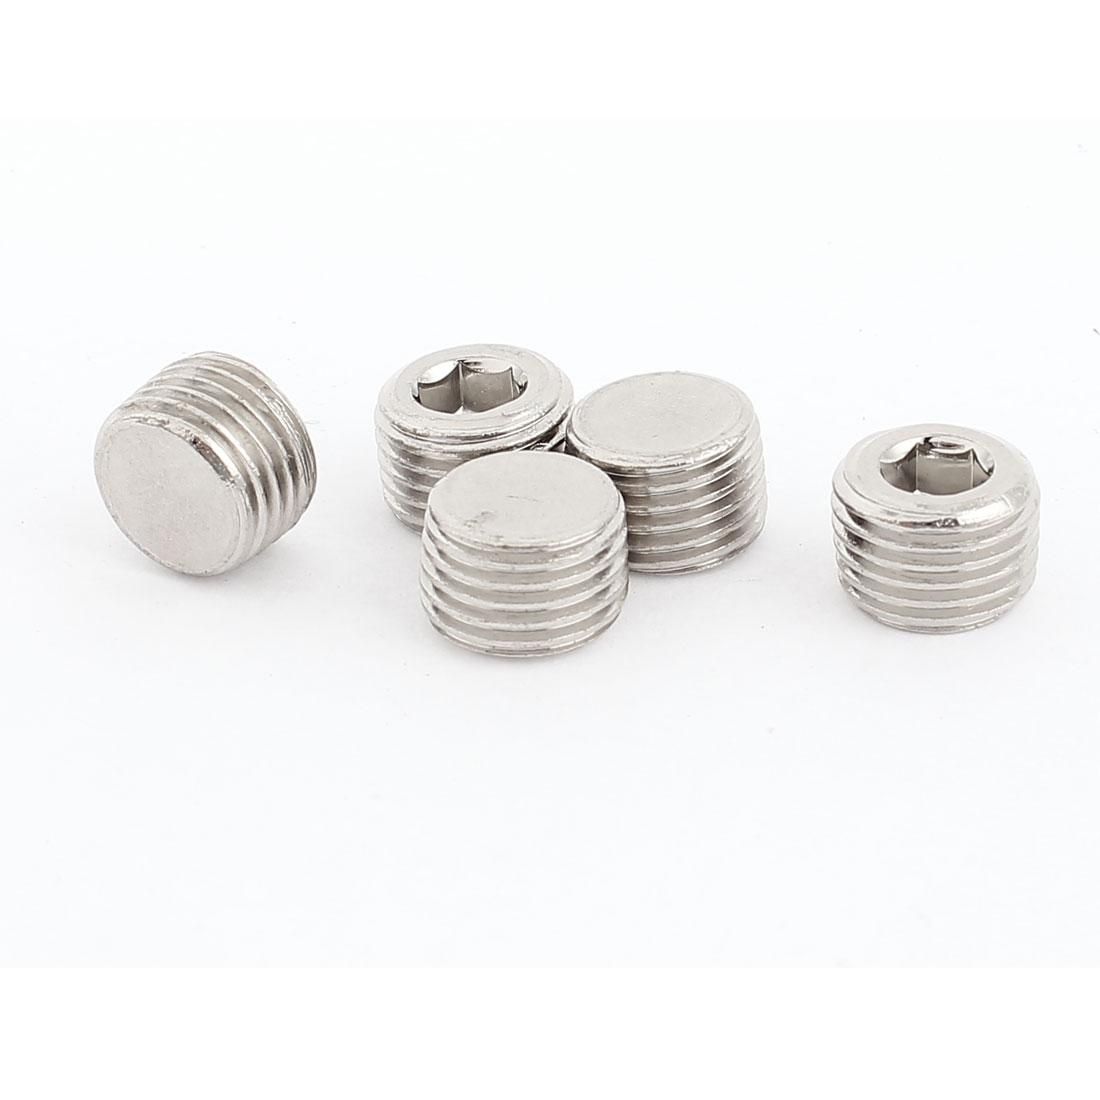 13mm x 9mm Stainless Steel Hex Socket Set Cap Point Grub Screws 5pcs